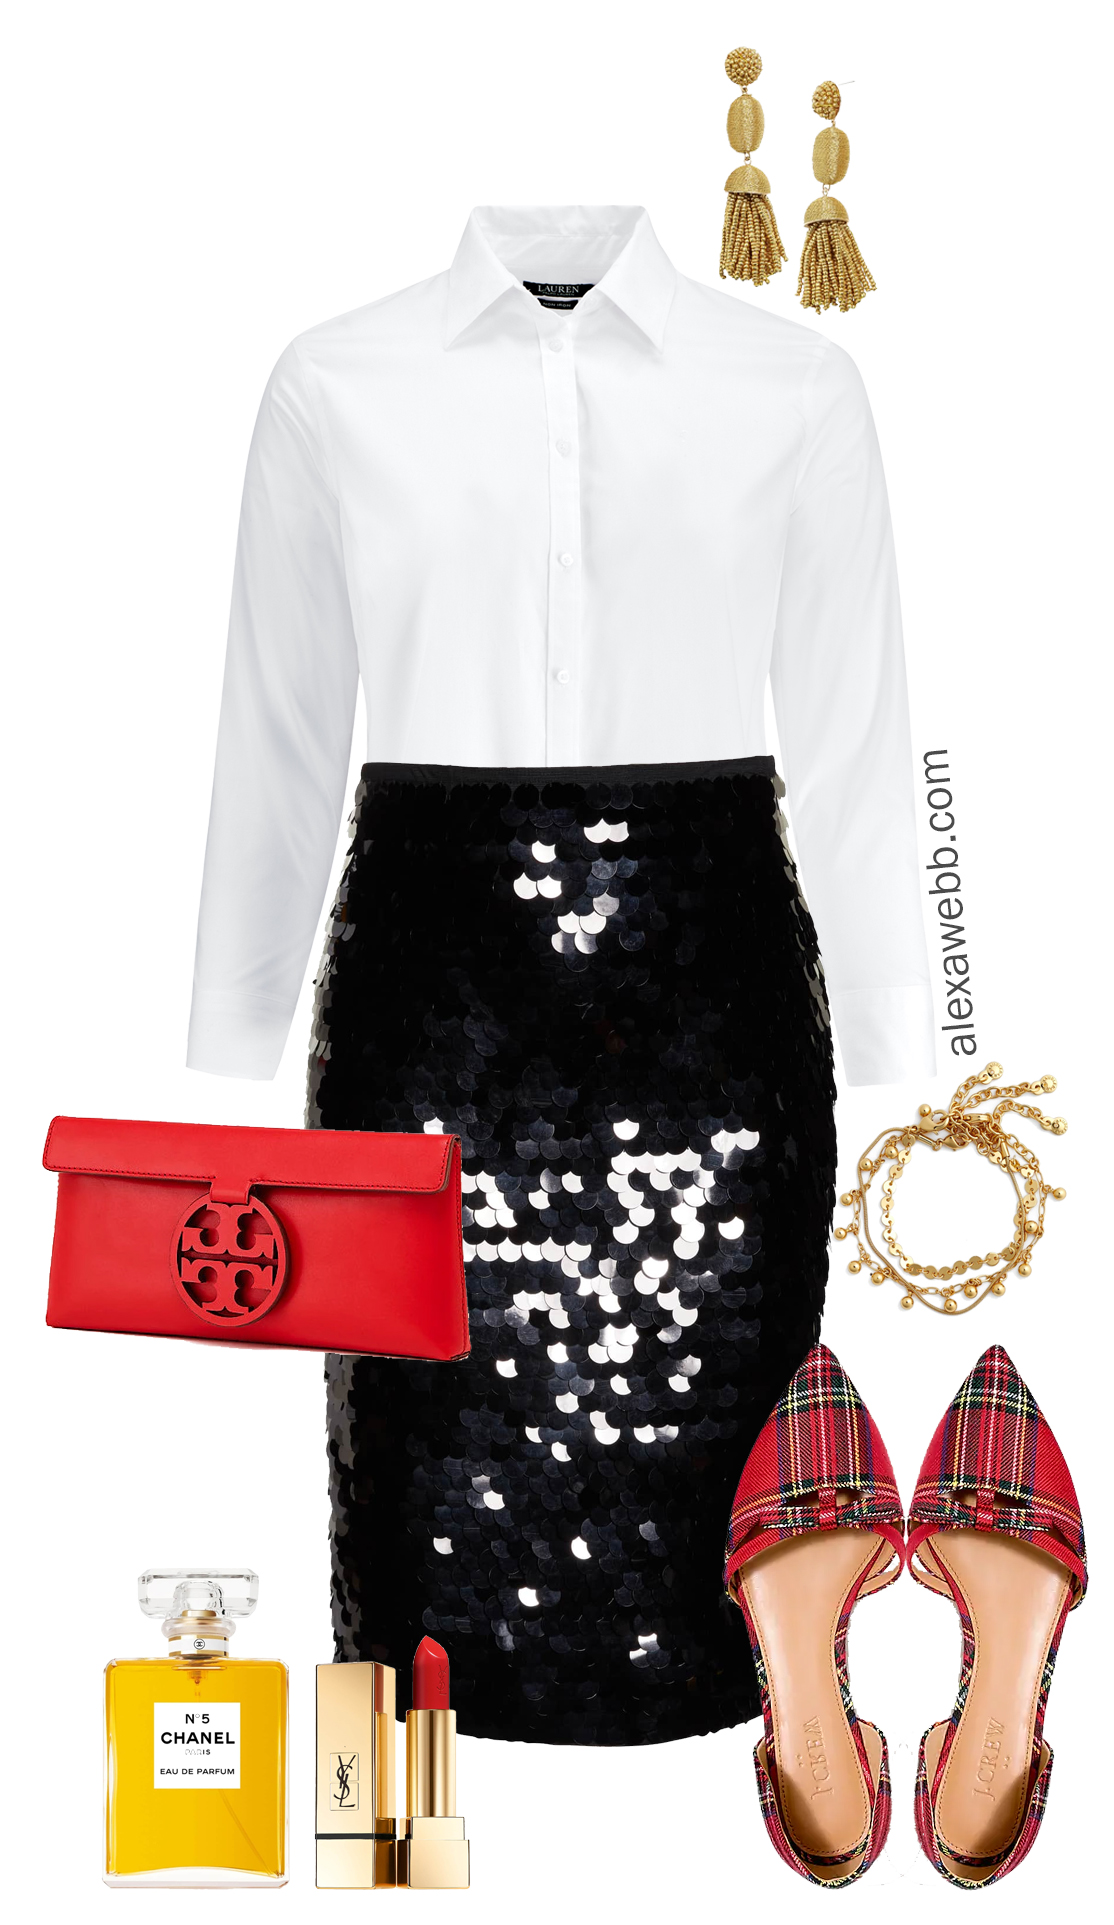 f5c120494ceae Plus Size Black Sequin Skirt Outfits - Alexa Webb